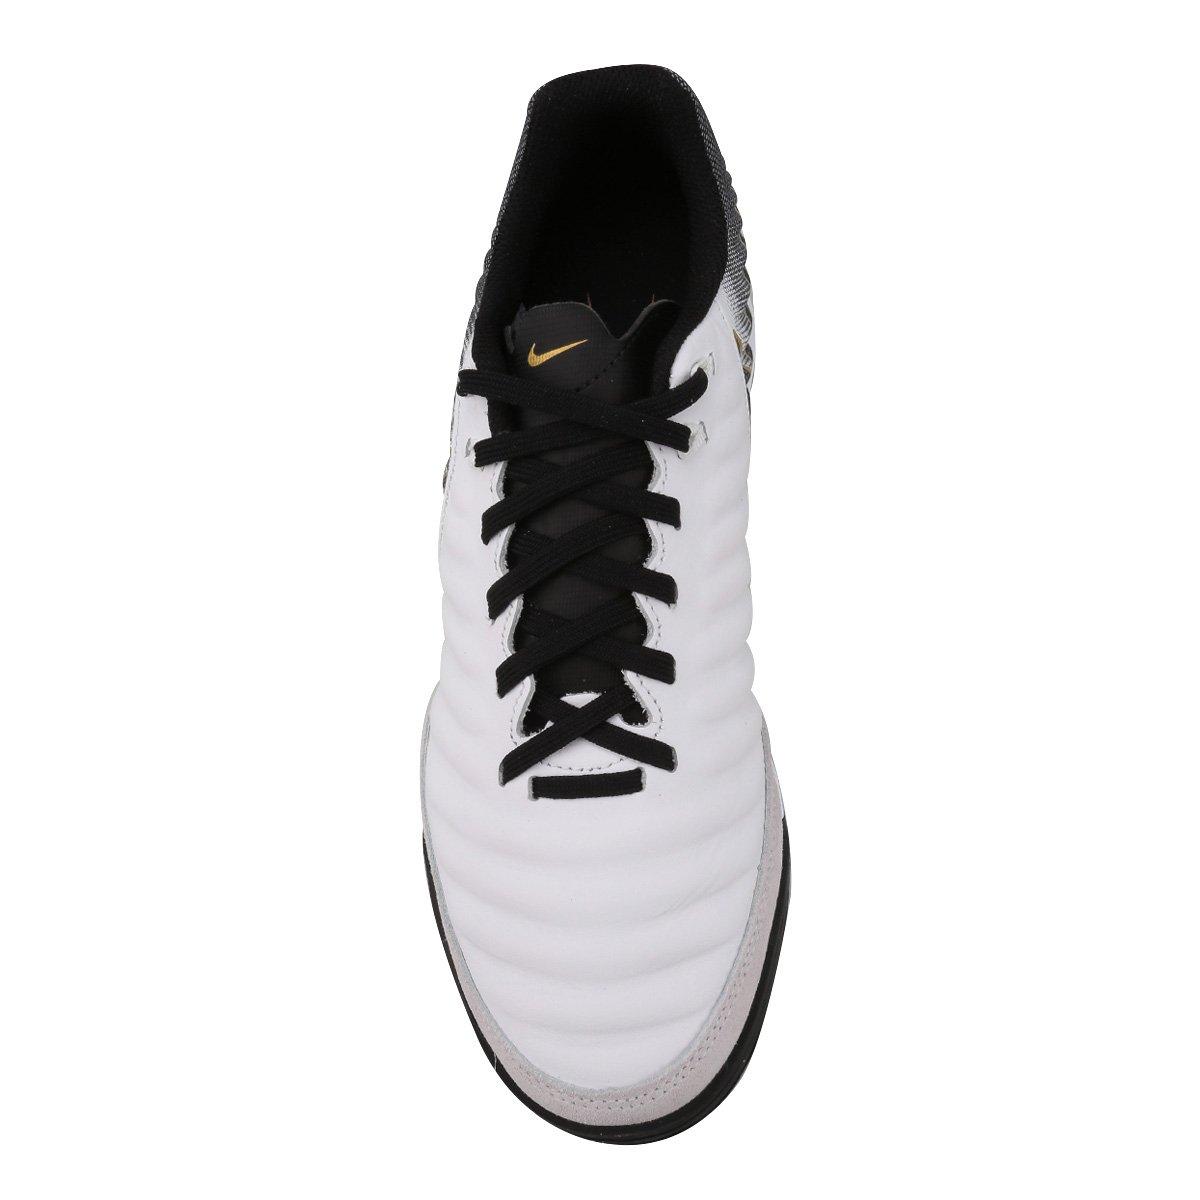 177de956ef Chuteira Futsal Nike Tiempo Legend 7 Academy IC - Branco e Preto ...